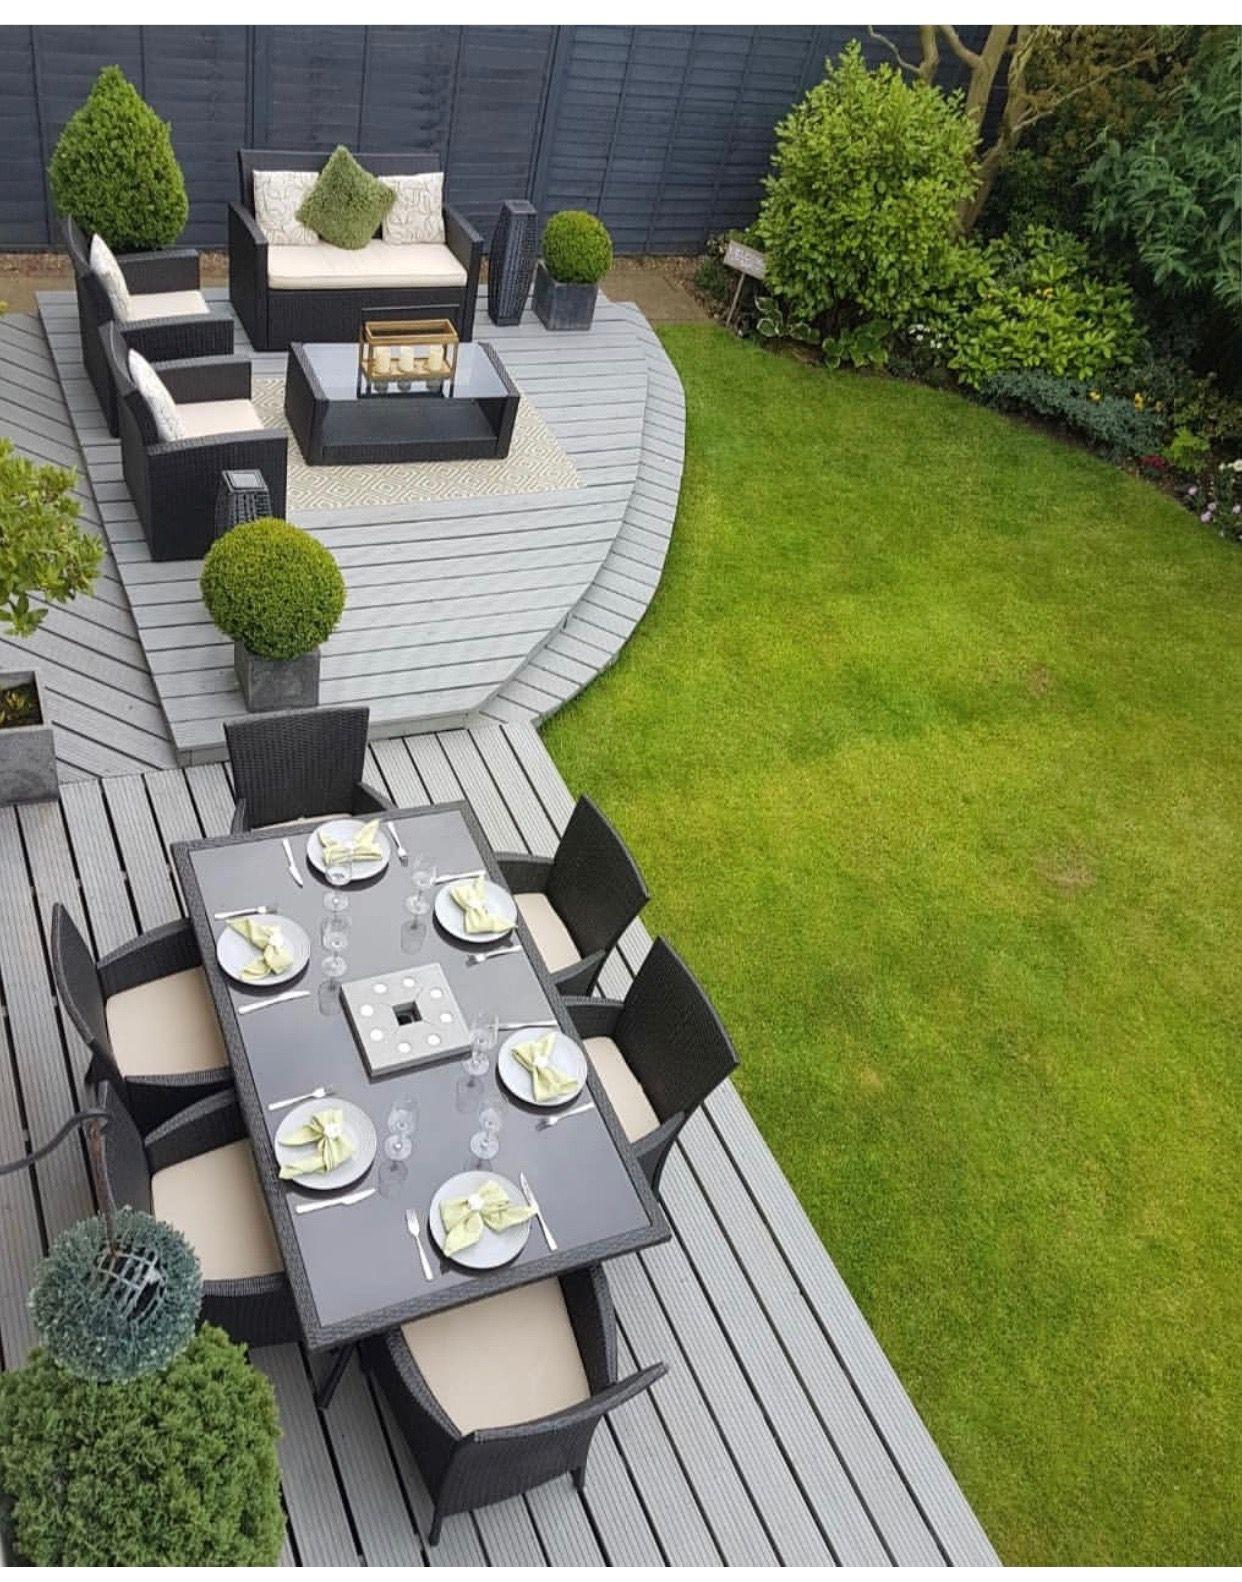 Pin By Carine Bon Coin On Petits Jardins | Small Backyard ... avec Bon Coin Table De Jardin